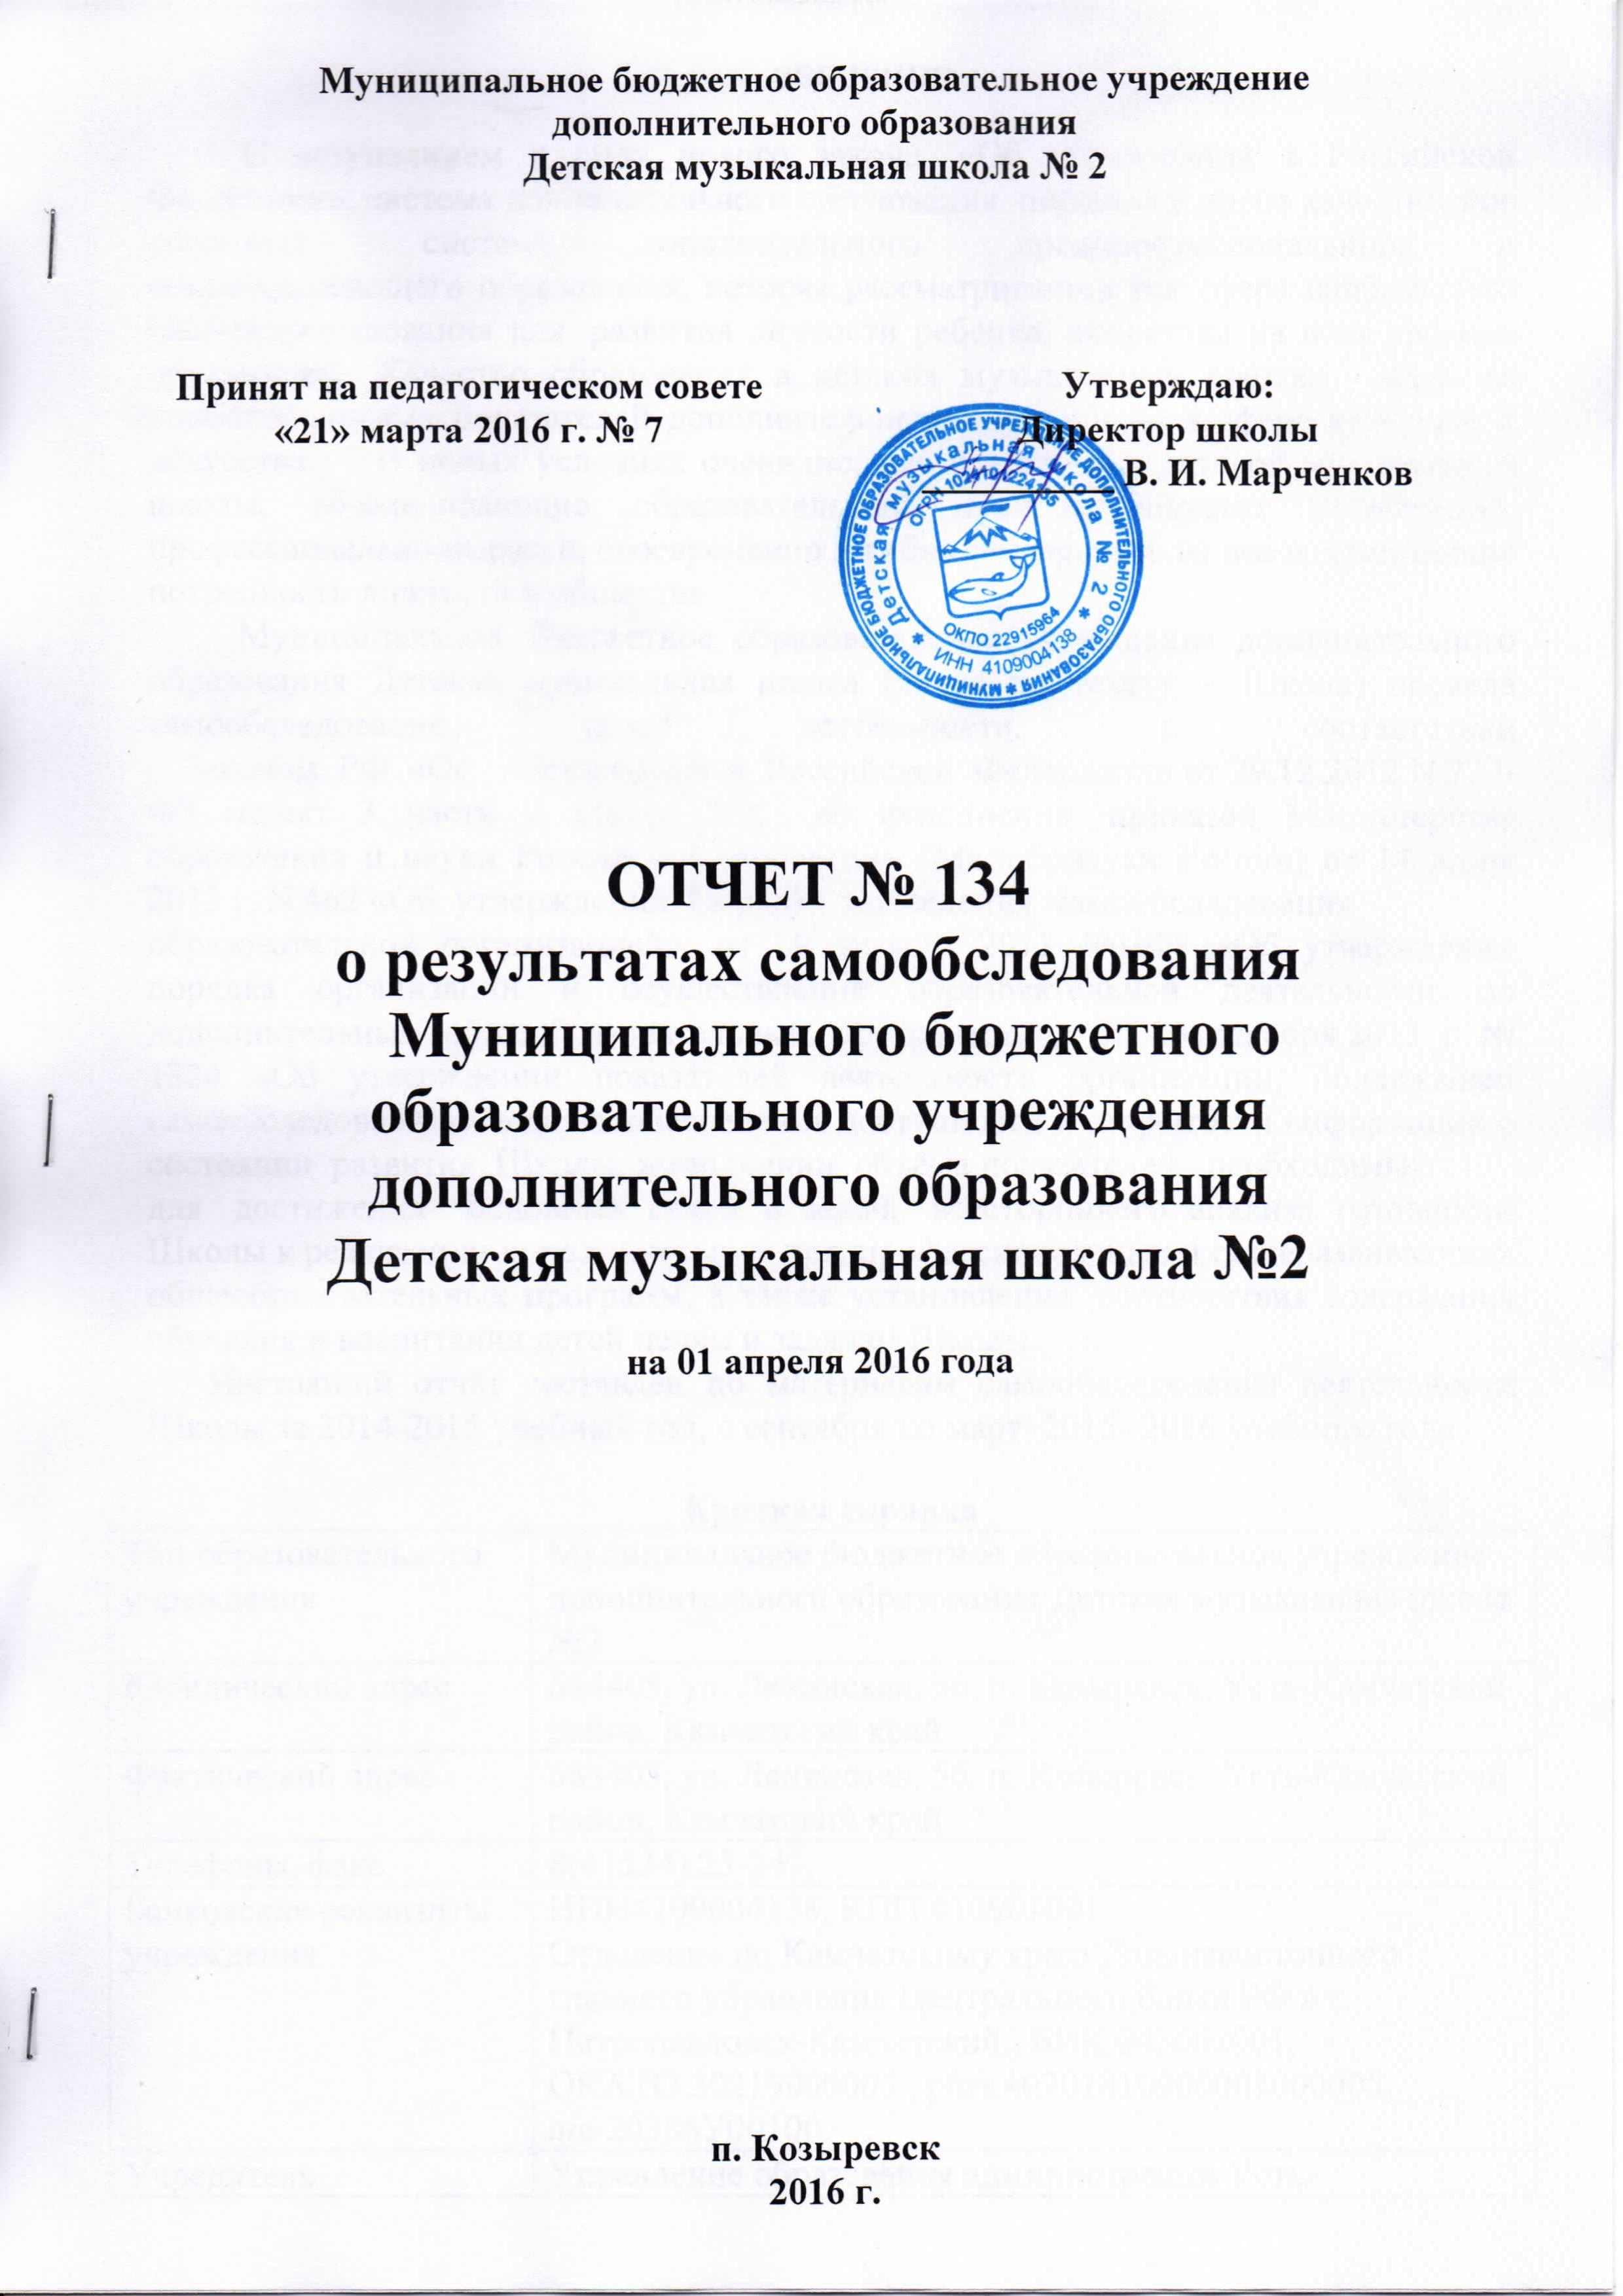 Отчет о самообследовании МБОУДО ДМШ №2 01.04.16_01